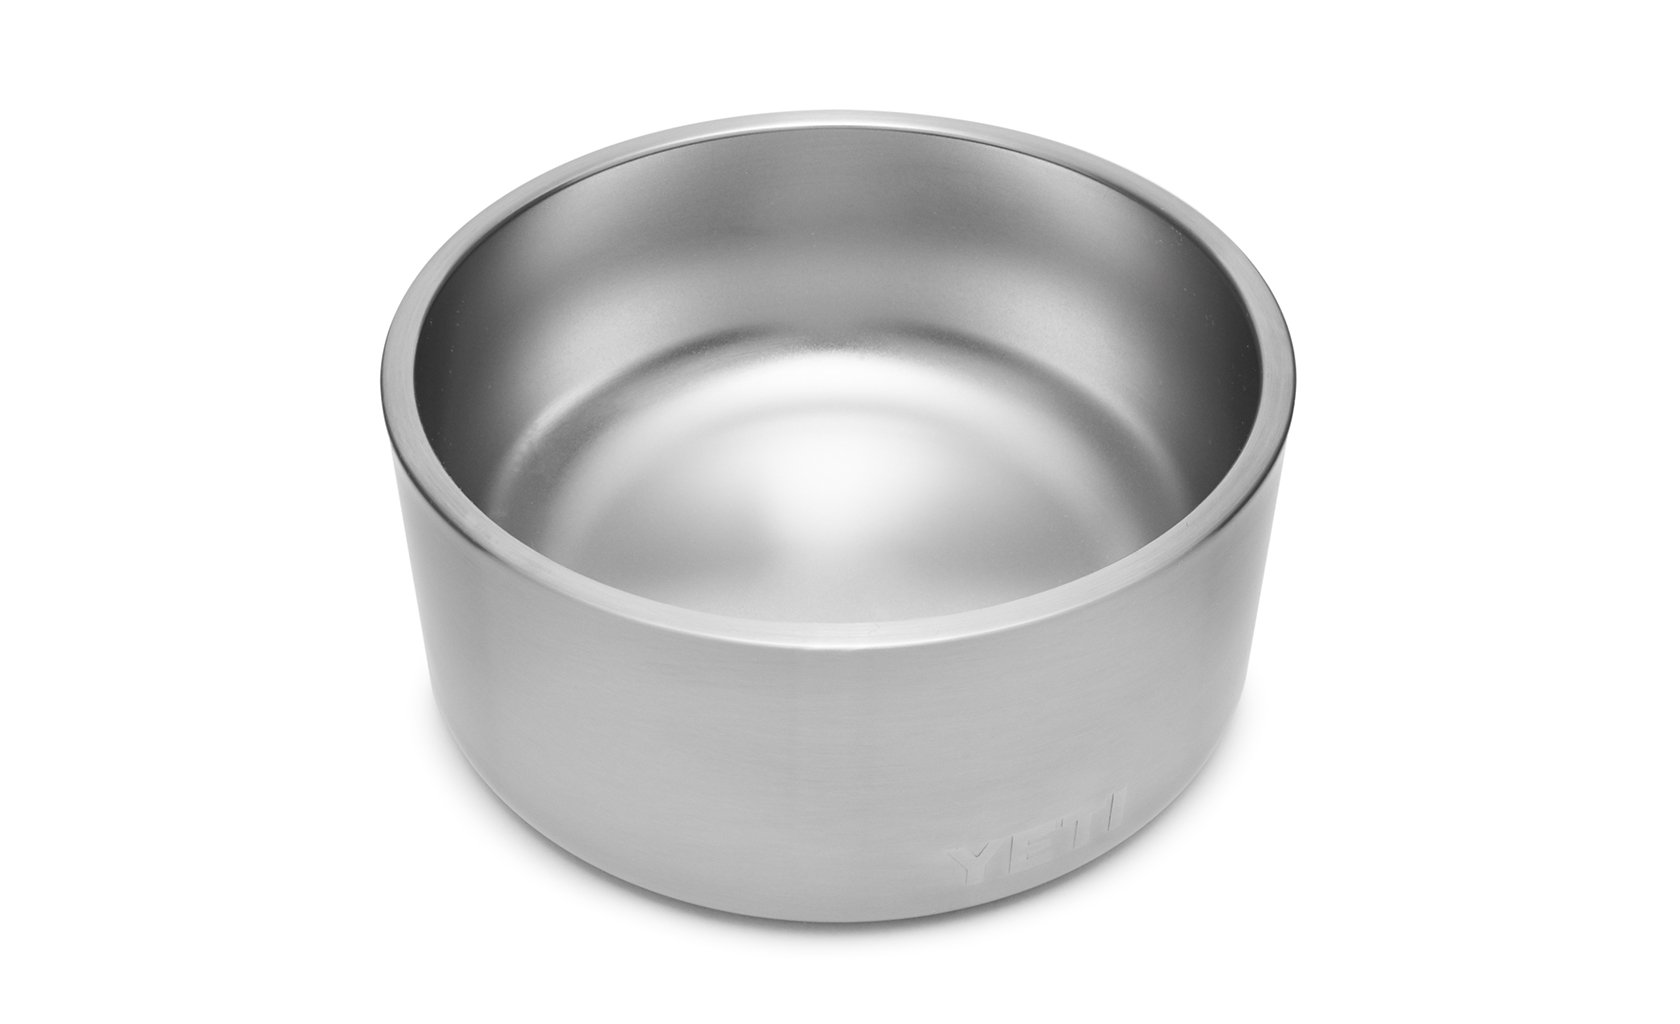 180568-Boomer-Dog-Bowl-Website-Assets-Studio-Boomer-8-Dog-Bowl-Stainless-Front-Quarter-Facing-Overhead-1680x1024-1551071085300